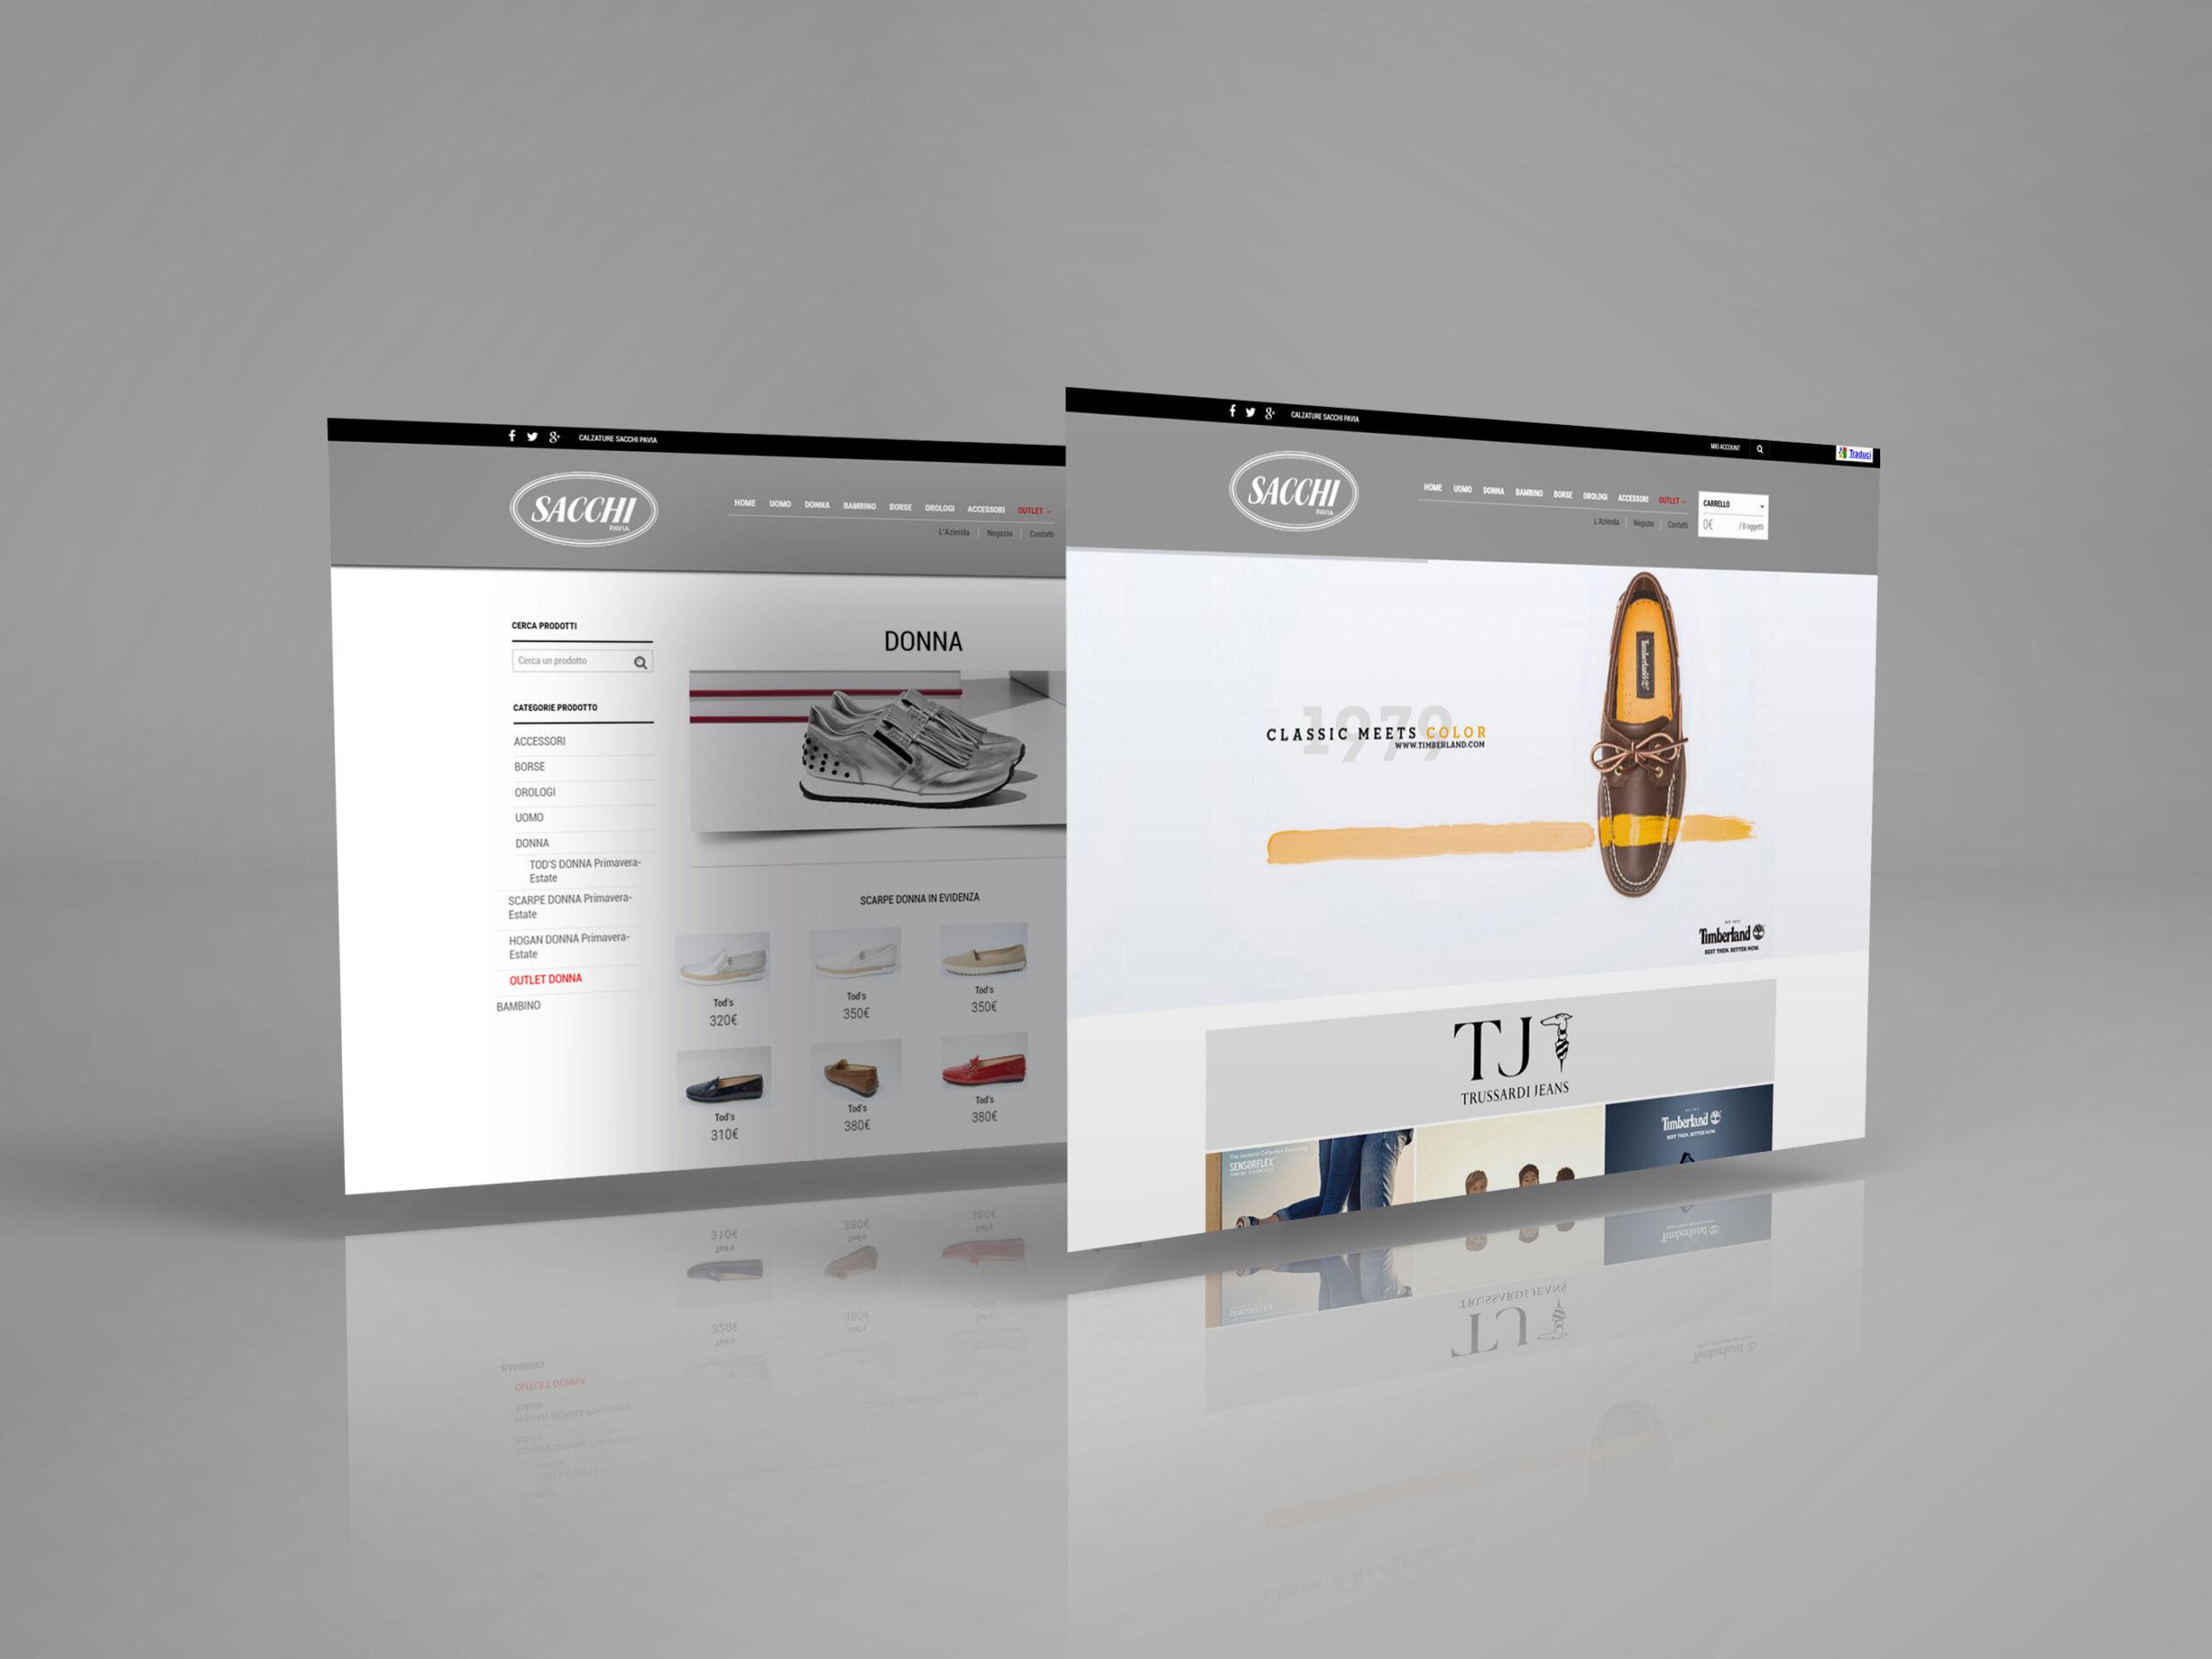 Sito Web Ecommerce Calzature Sacchi